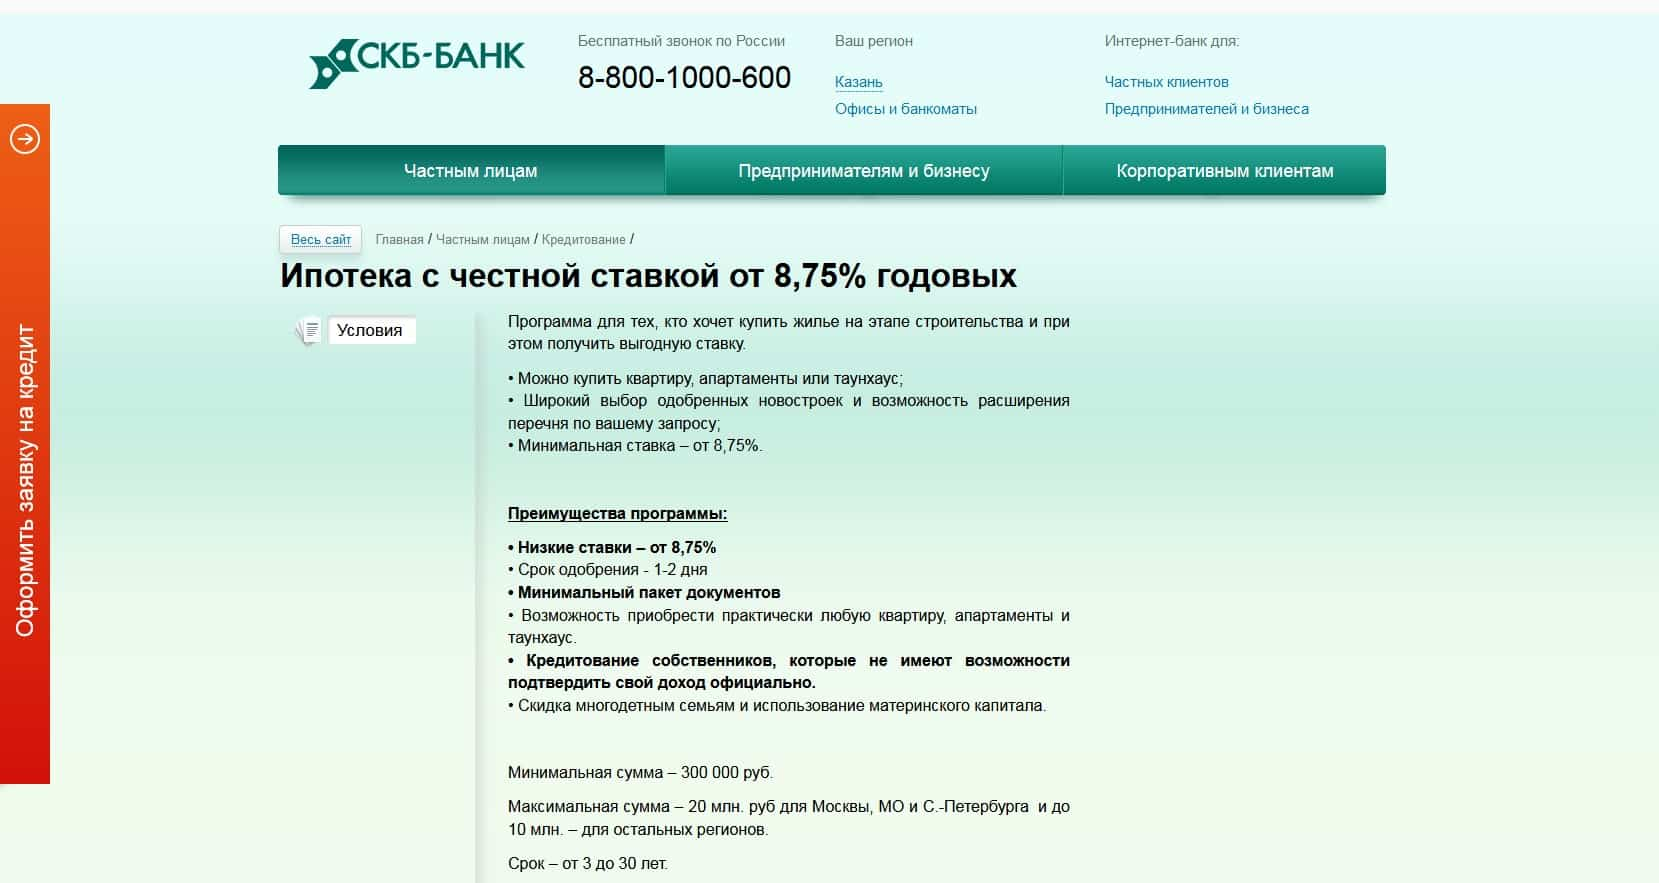 ставка по ипотеке скб банк